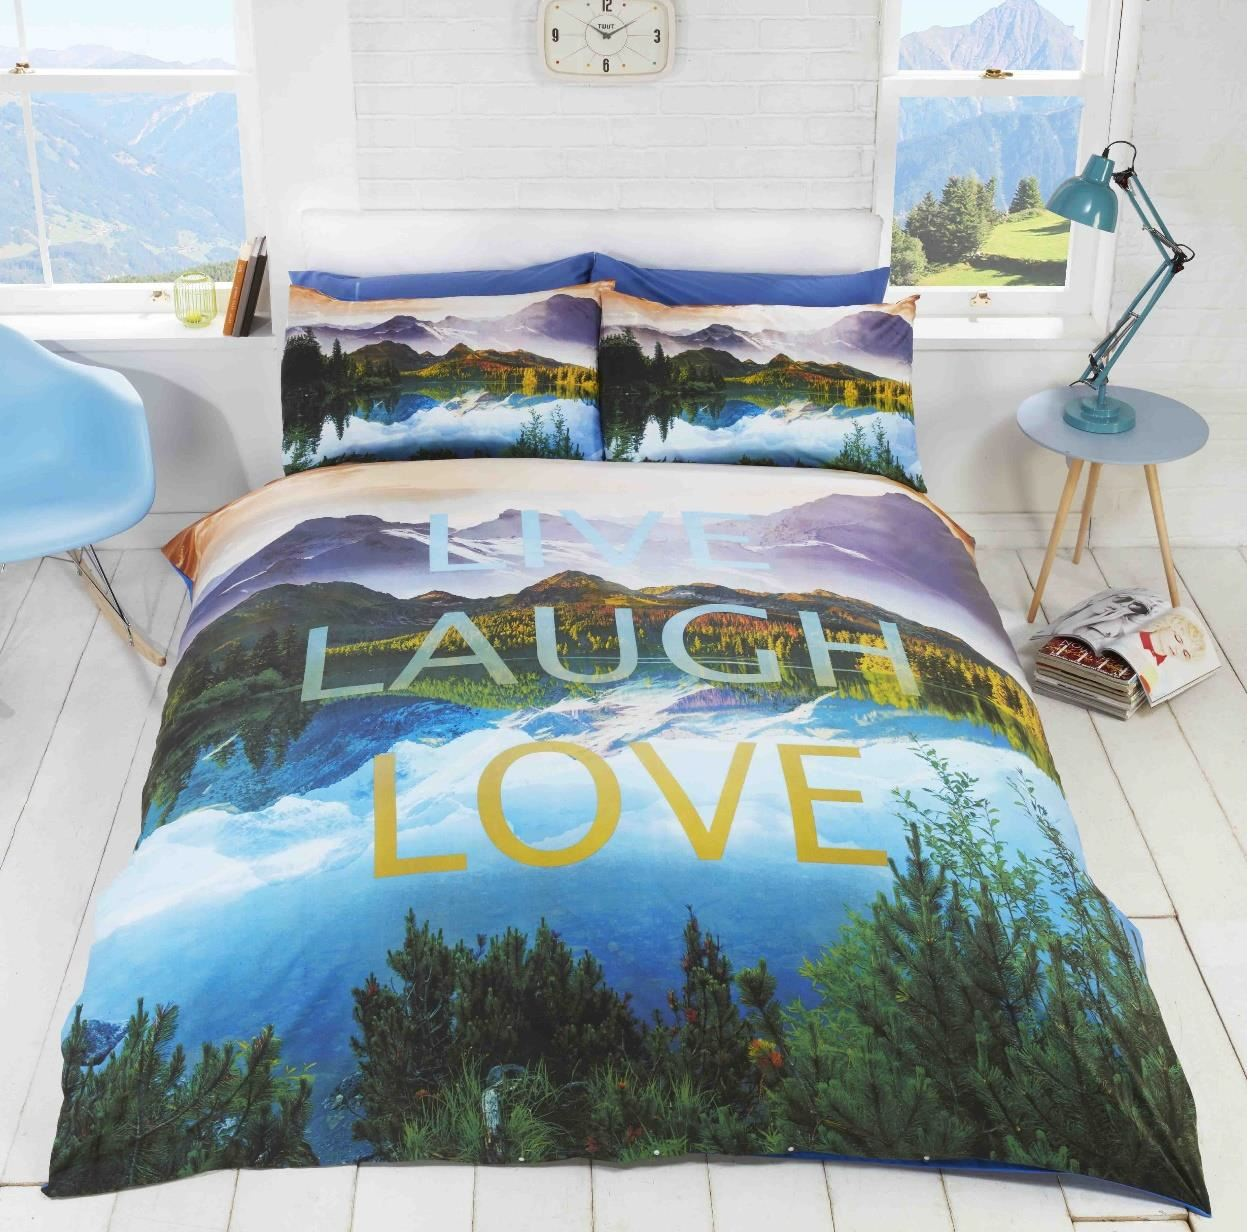 modern duvet cover  pillowcase bedding bed set urban teenager's  - modernduvetcoveramppillowcasebeddingbedset